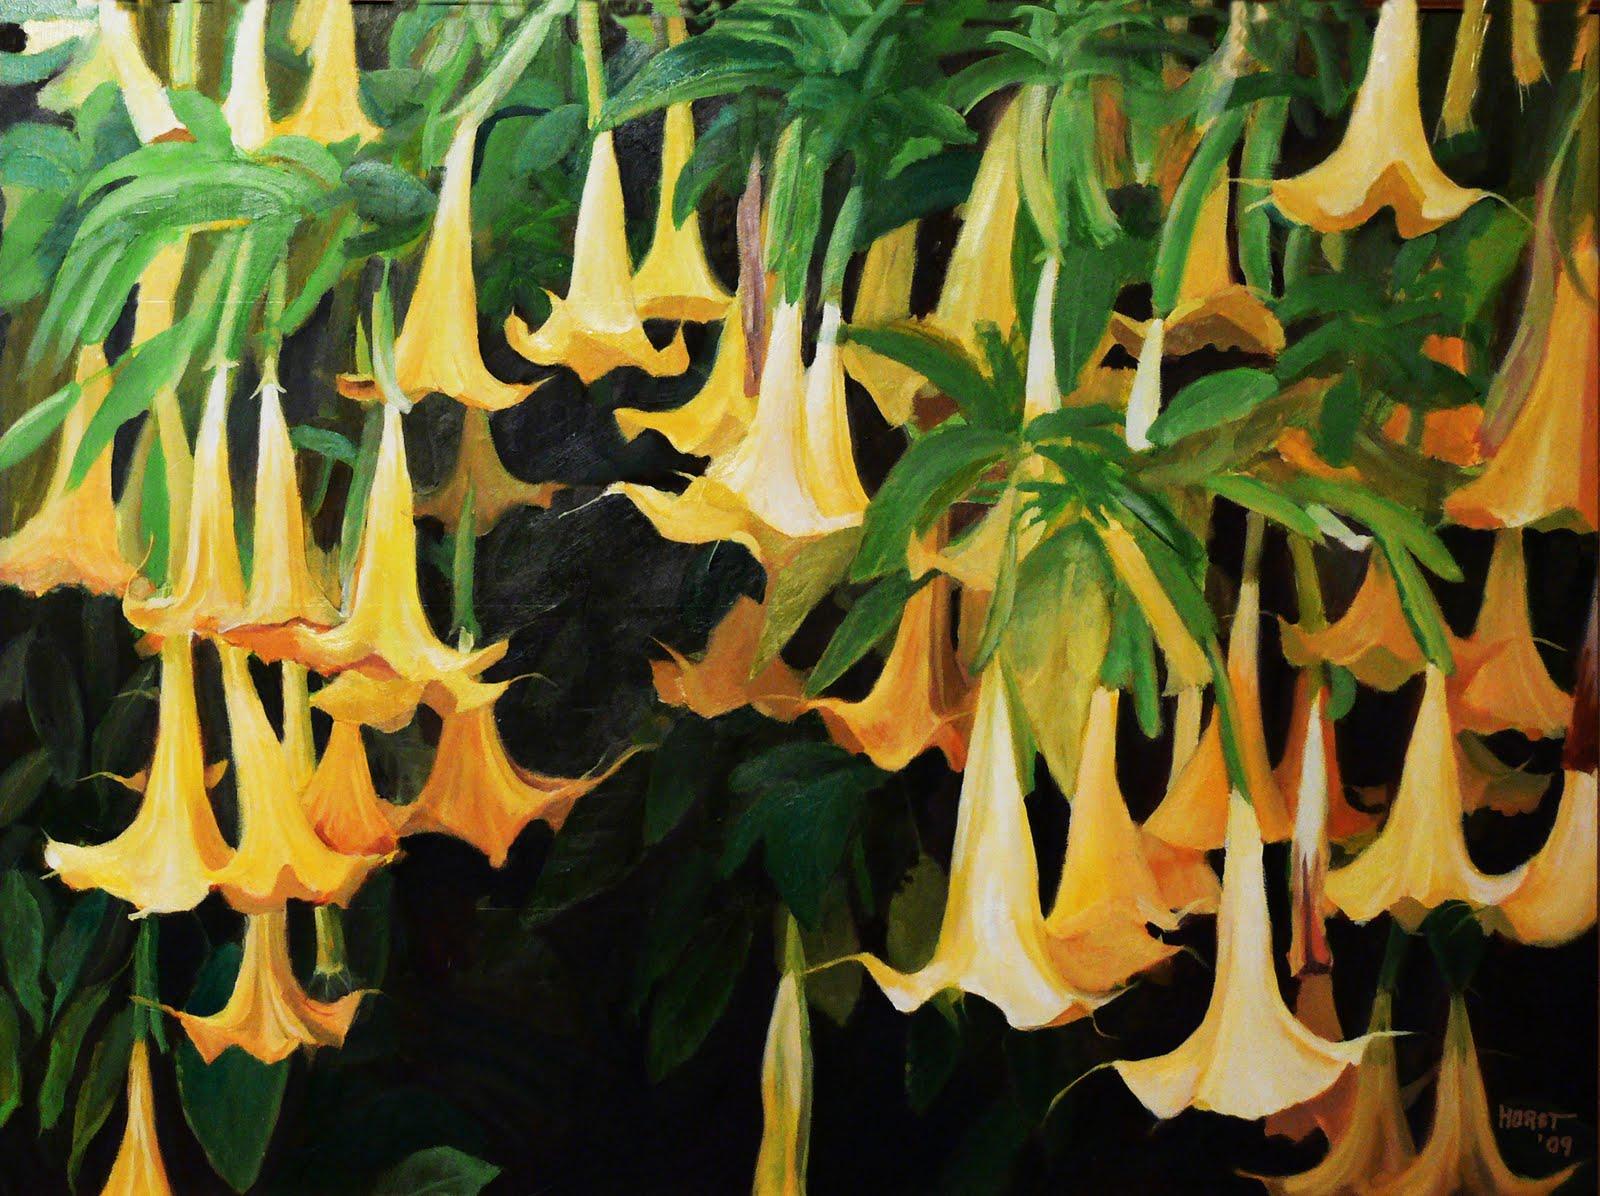 angel trumpet flower on Pinterest